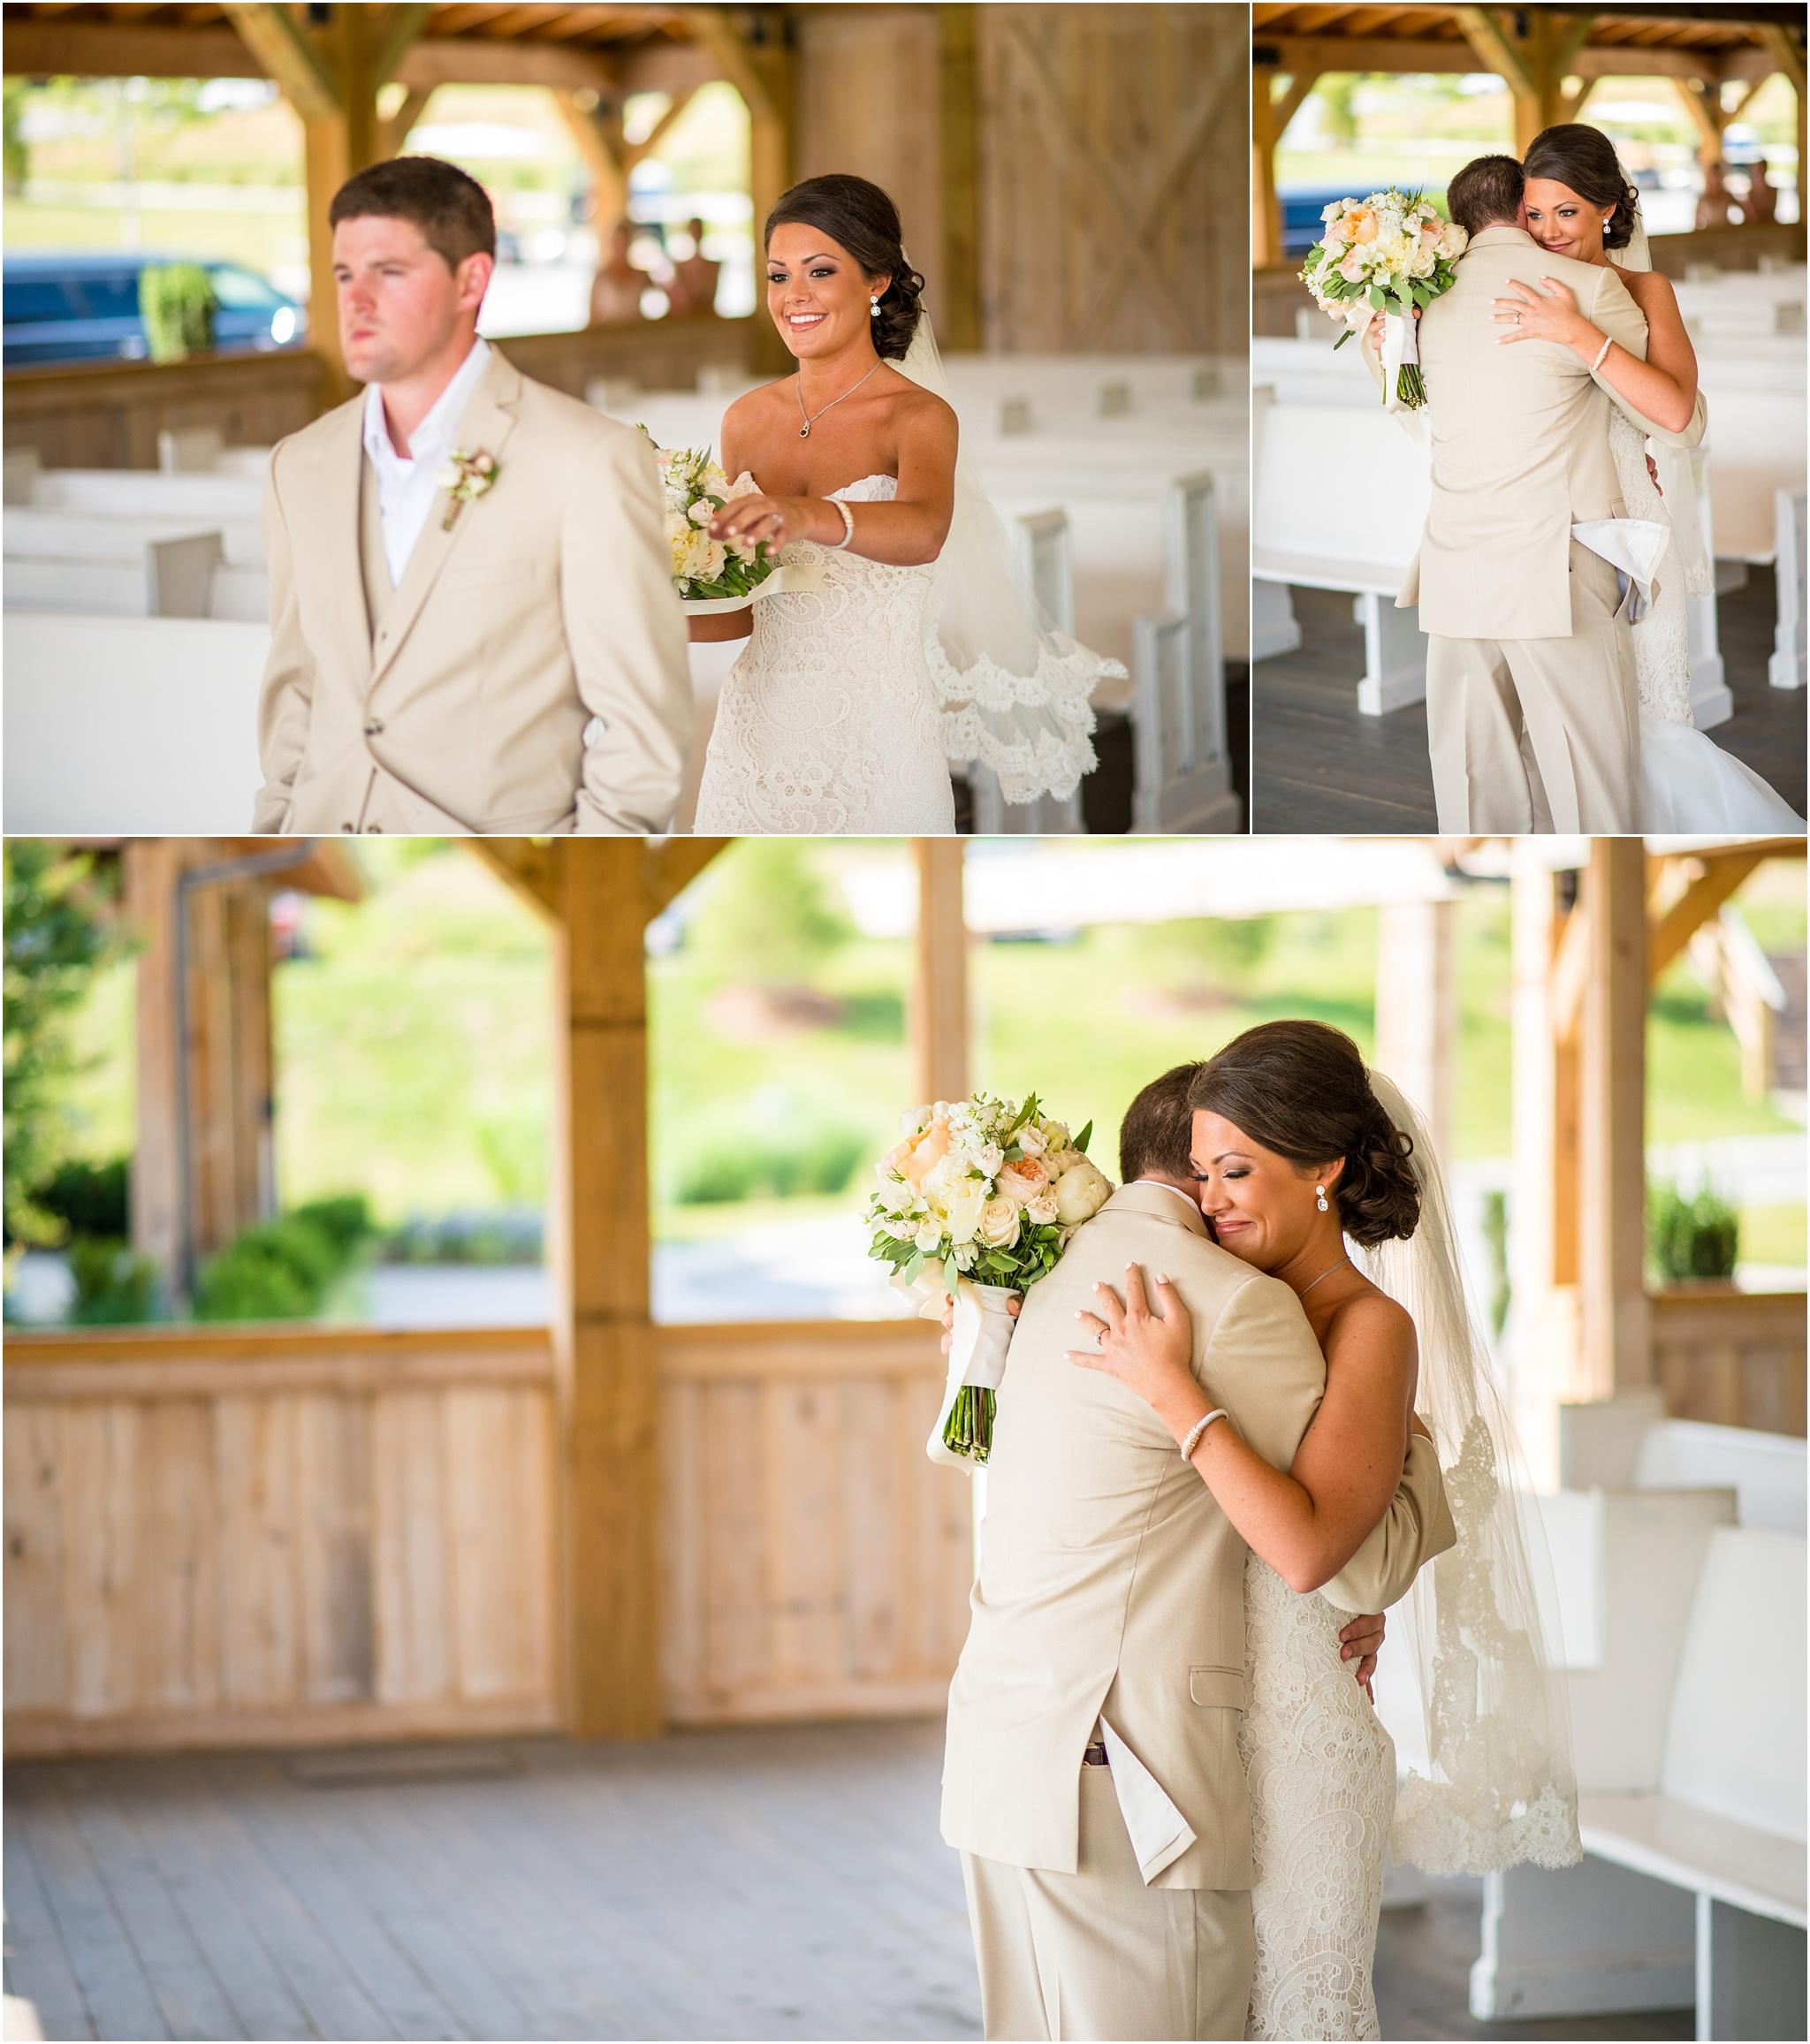 Greg Smit Photography Nashville wedding photographer Mint Springs Farm 7